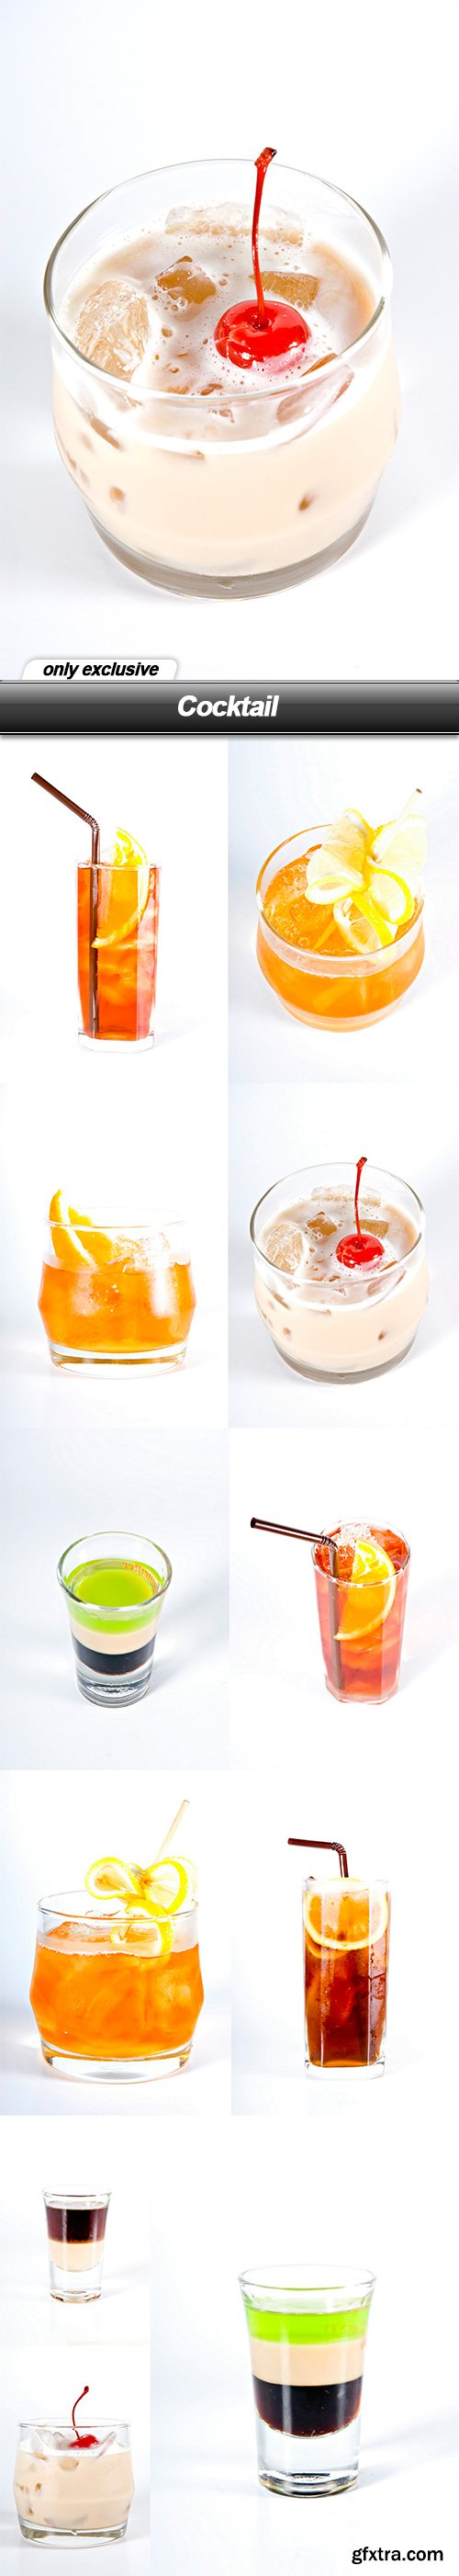 Cocktail - 11 UHQ JPEG